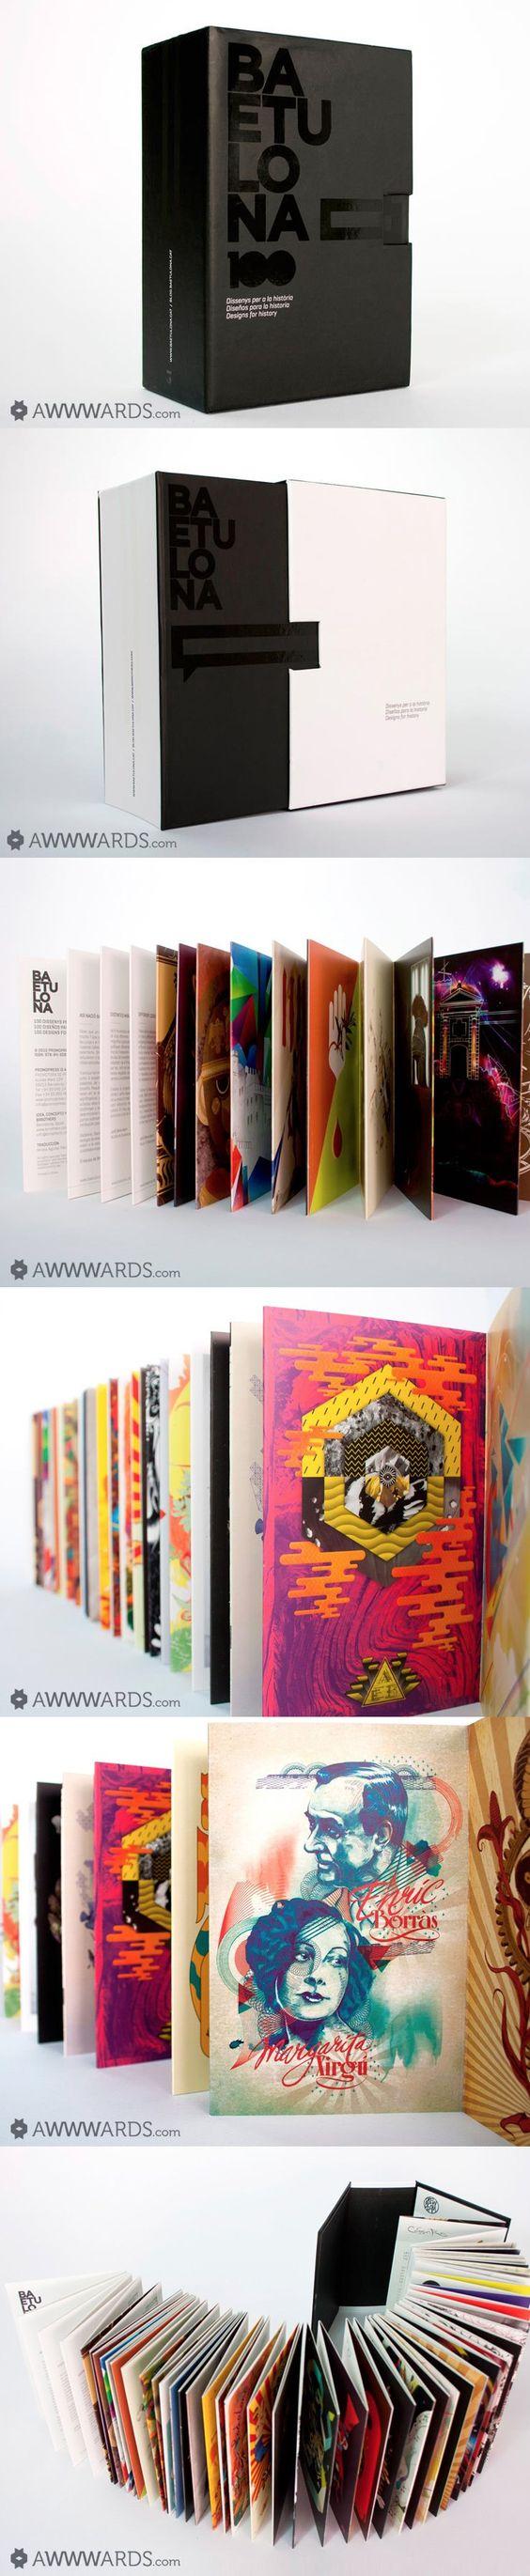 Baetulona: 100 Designs for History #Book #design #art